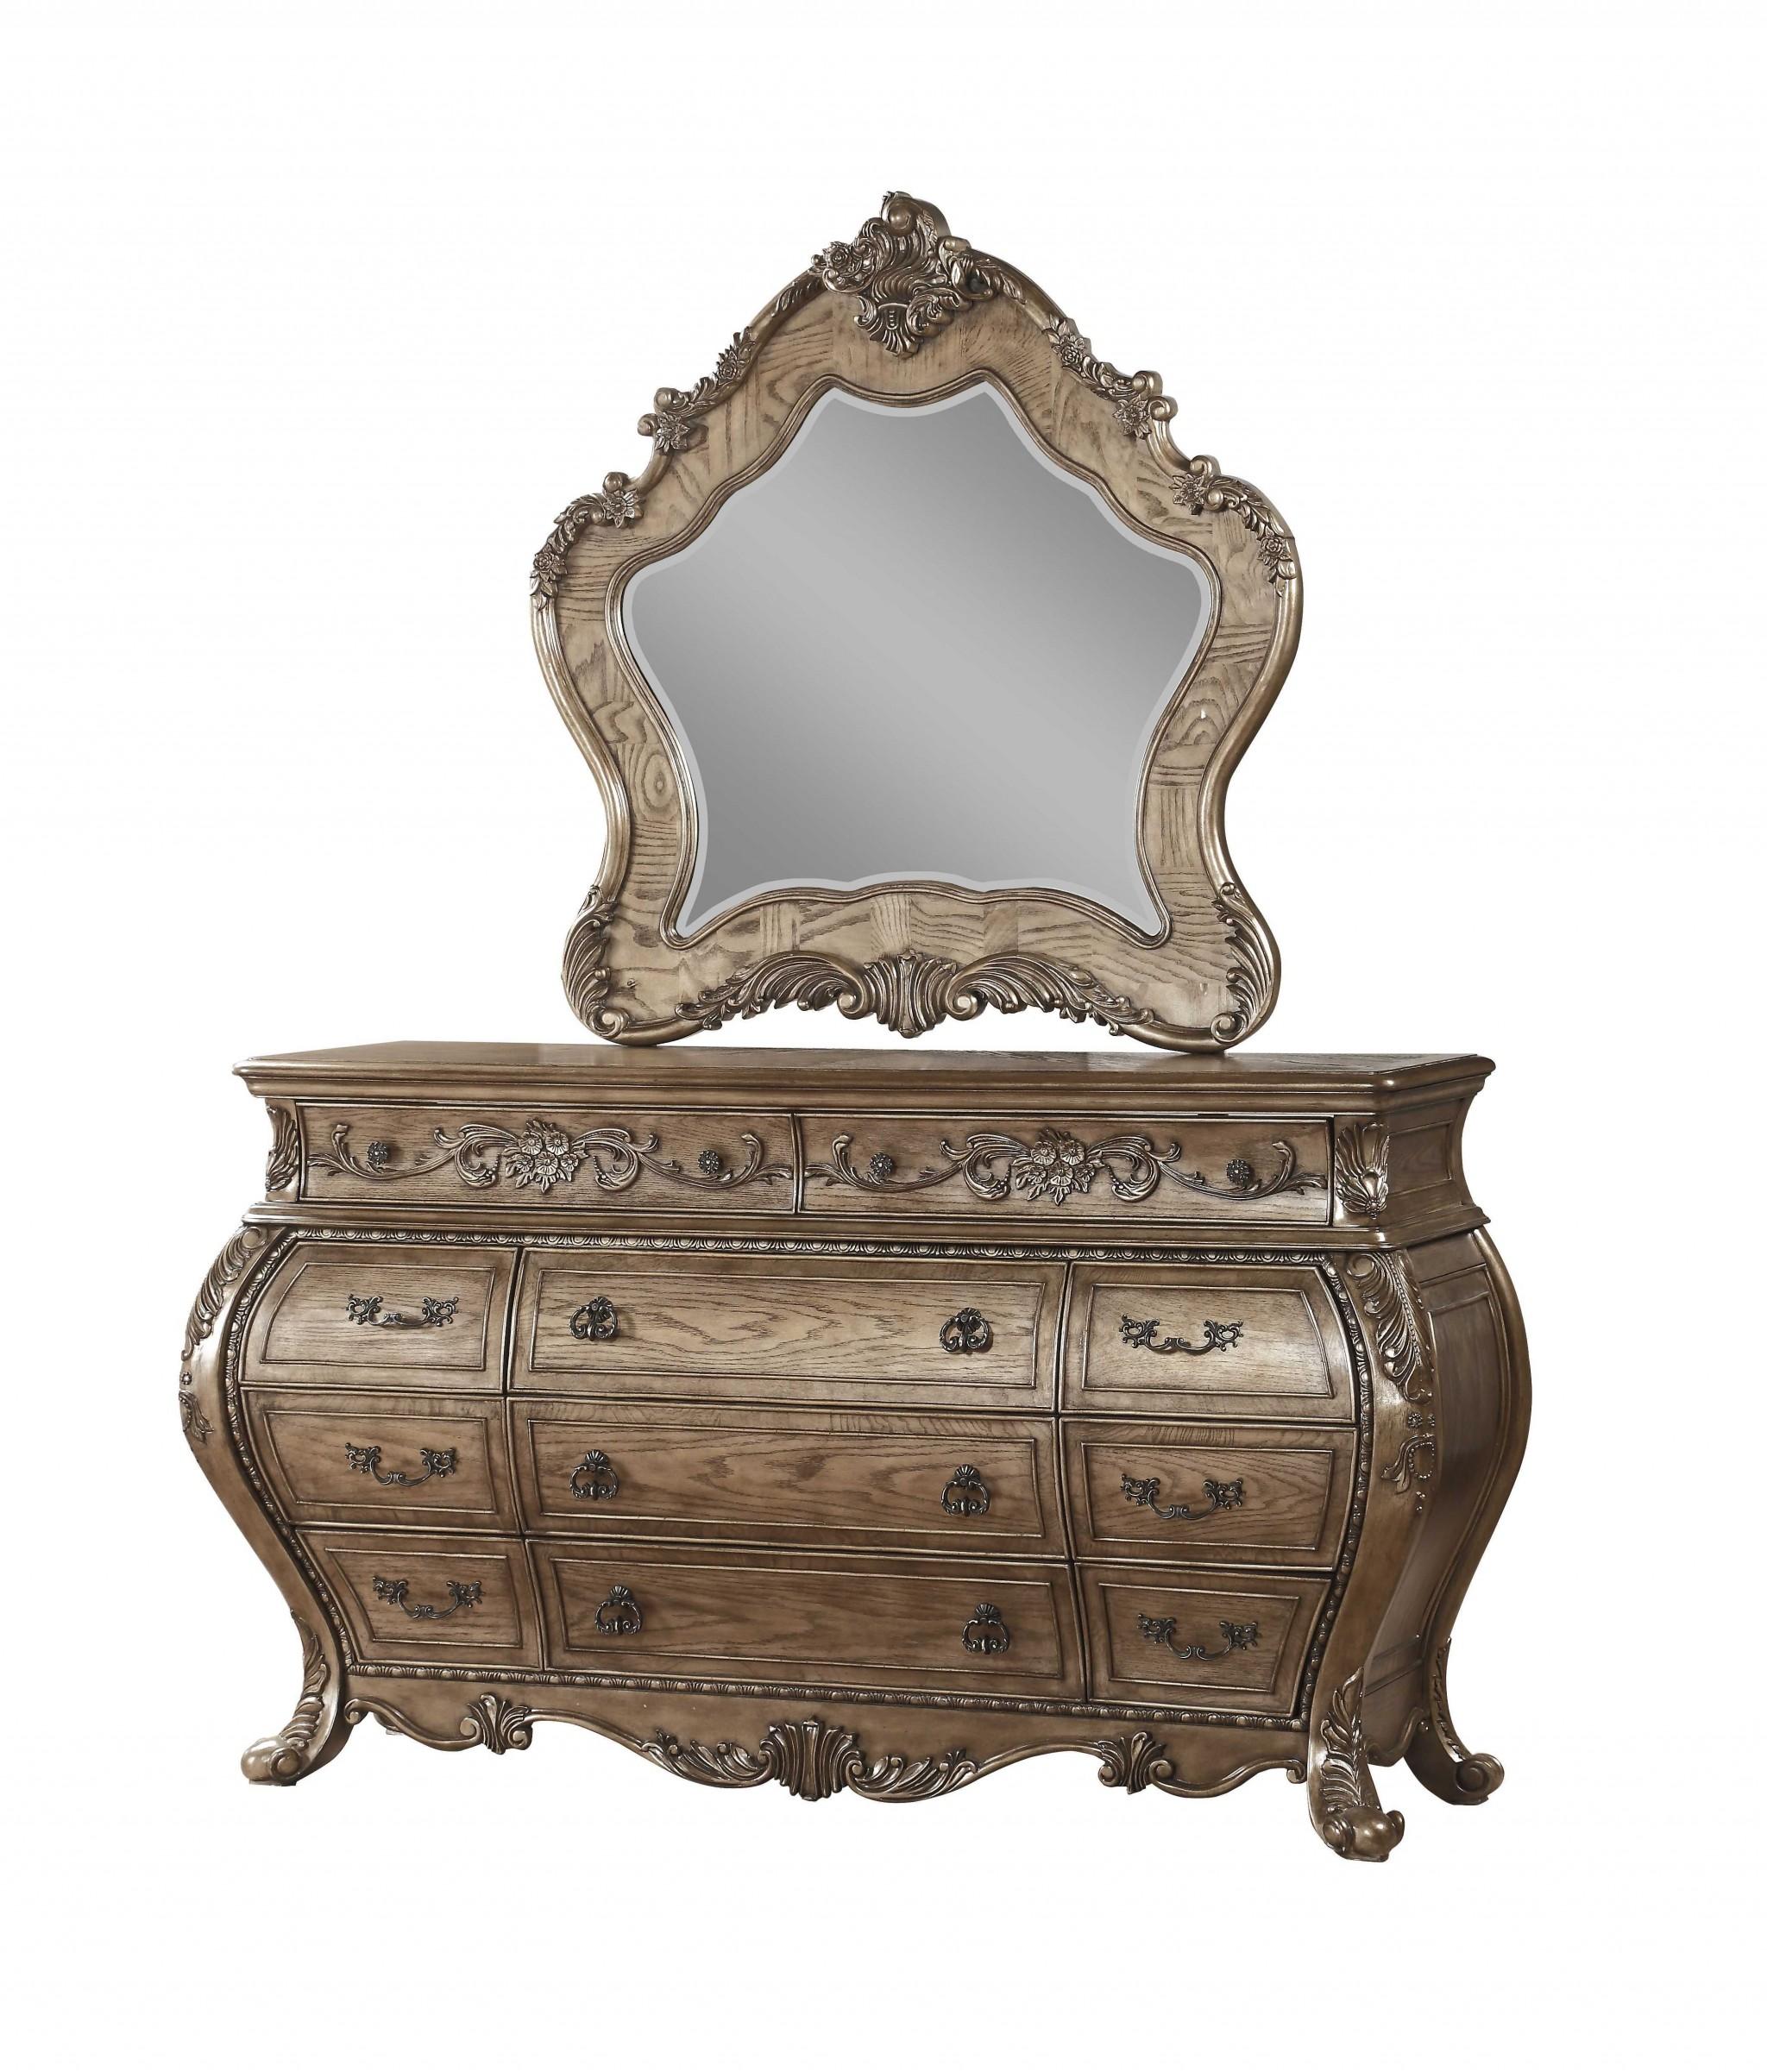 "23"" X 73"" X 41"" Vintage Oak Wood Dresser"